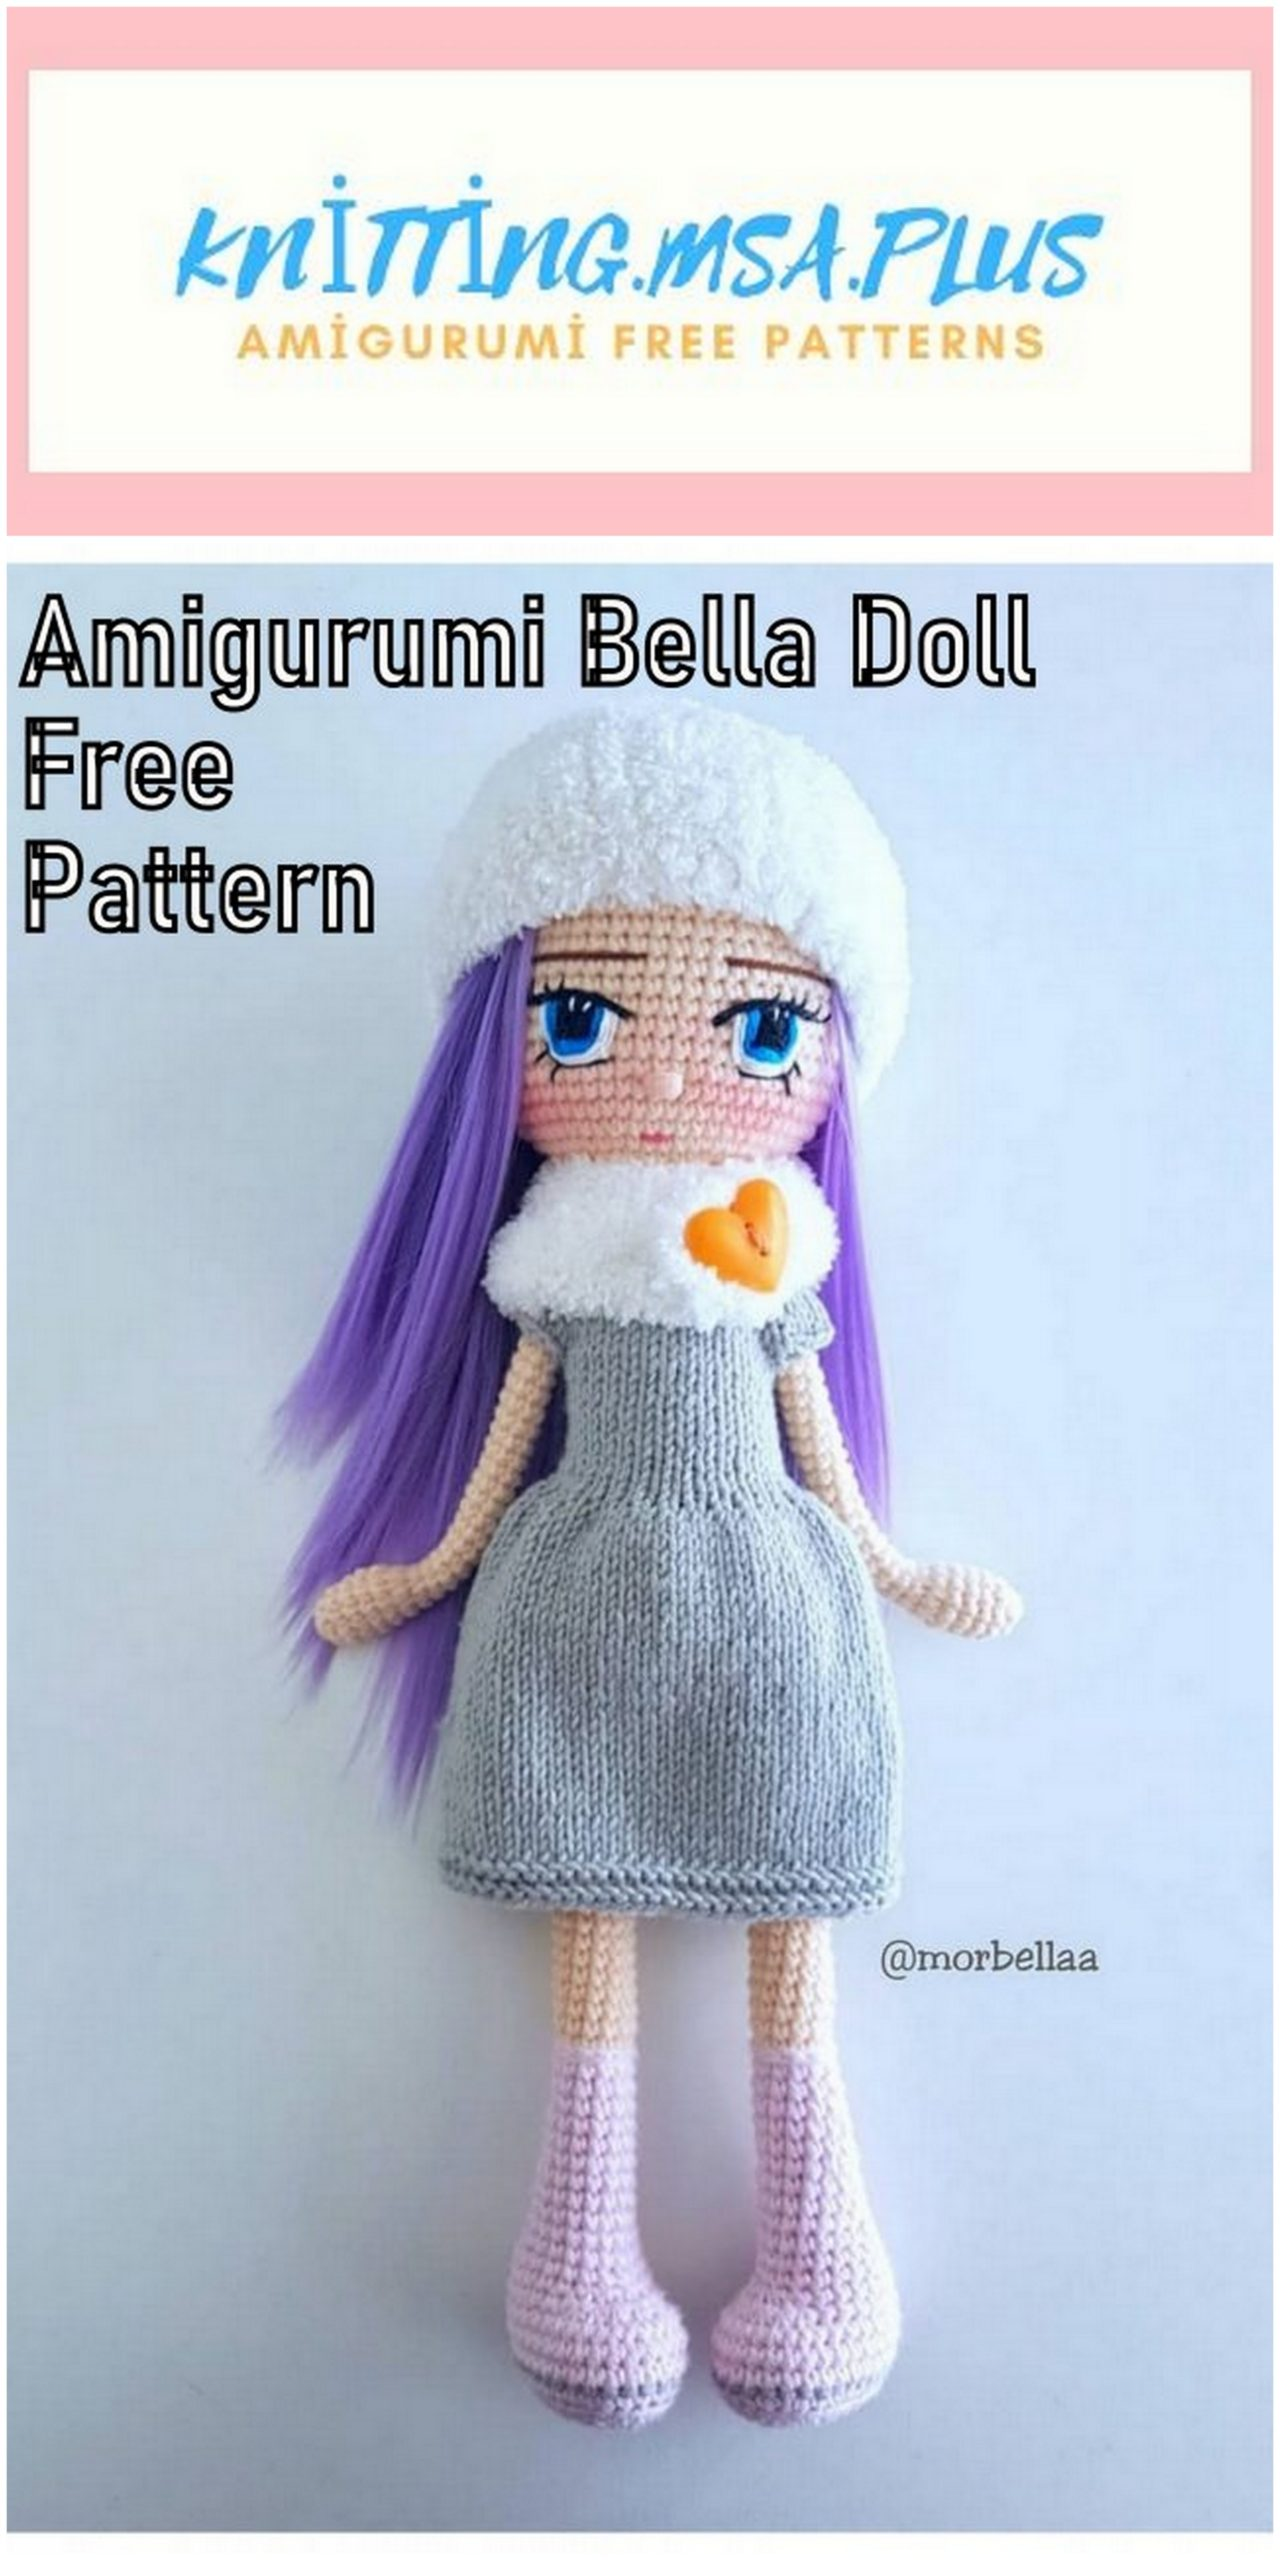 Amigurumi Doll Bella Free Crochet Pattern